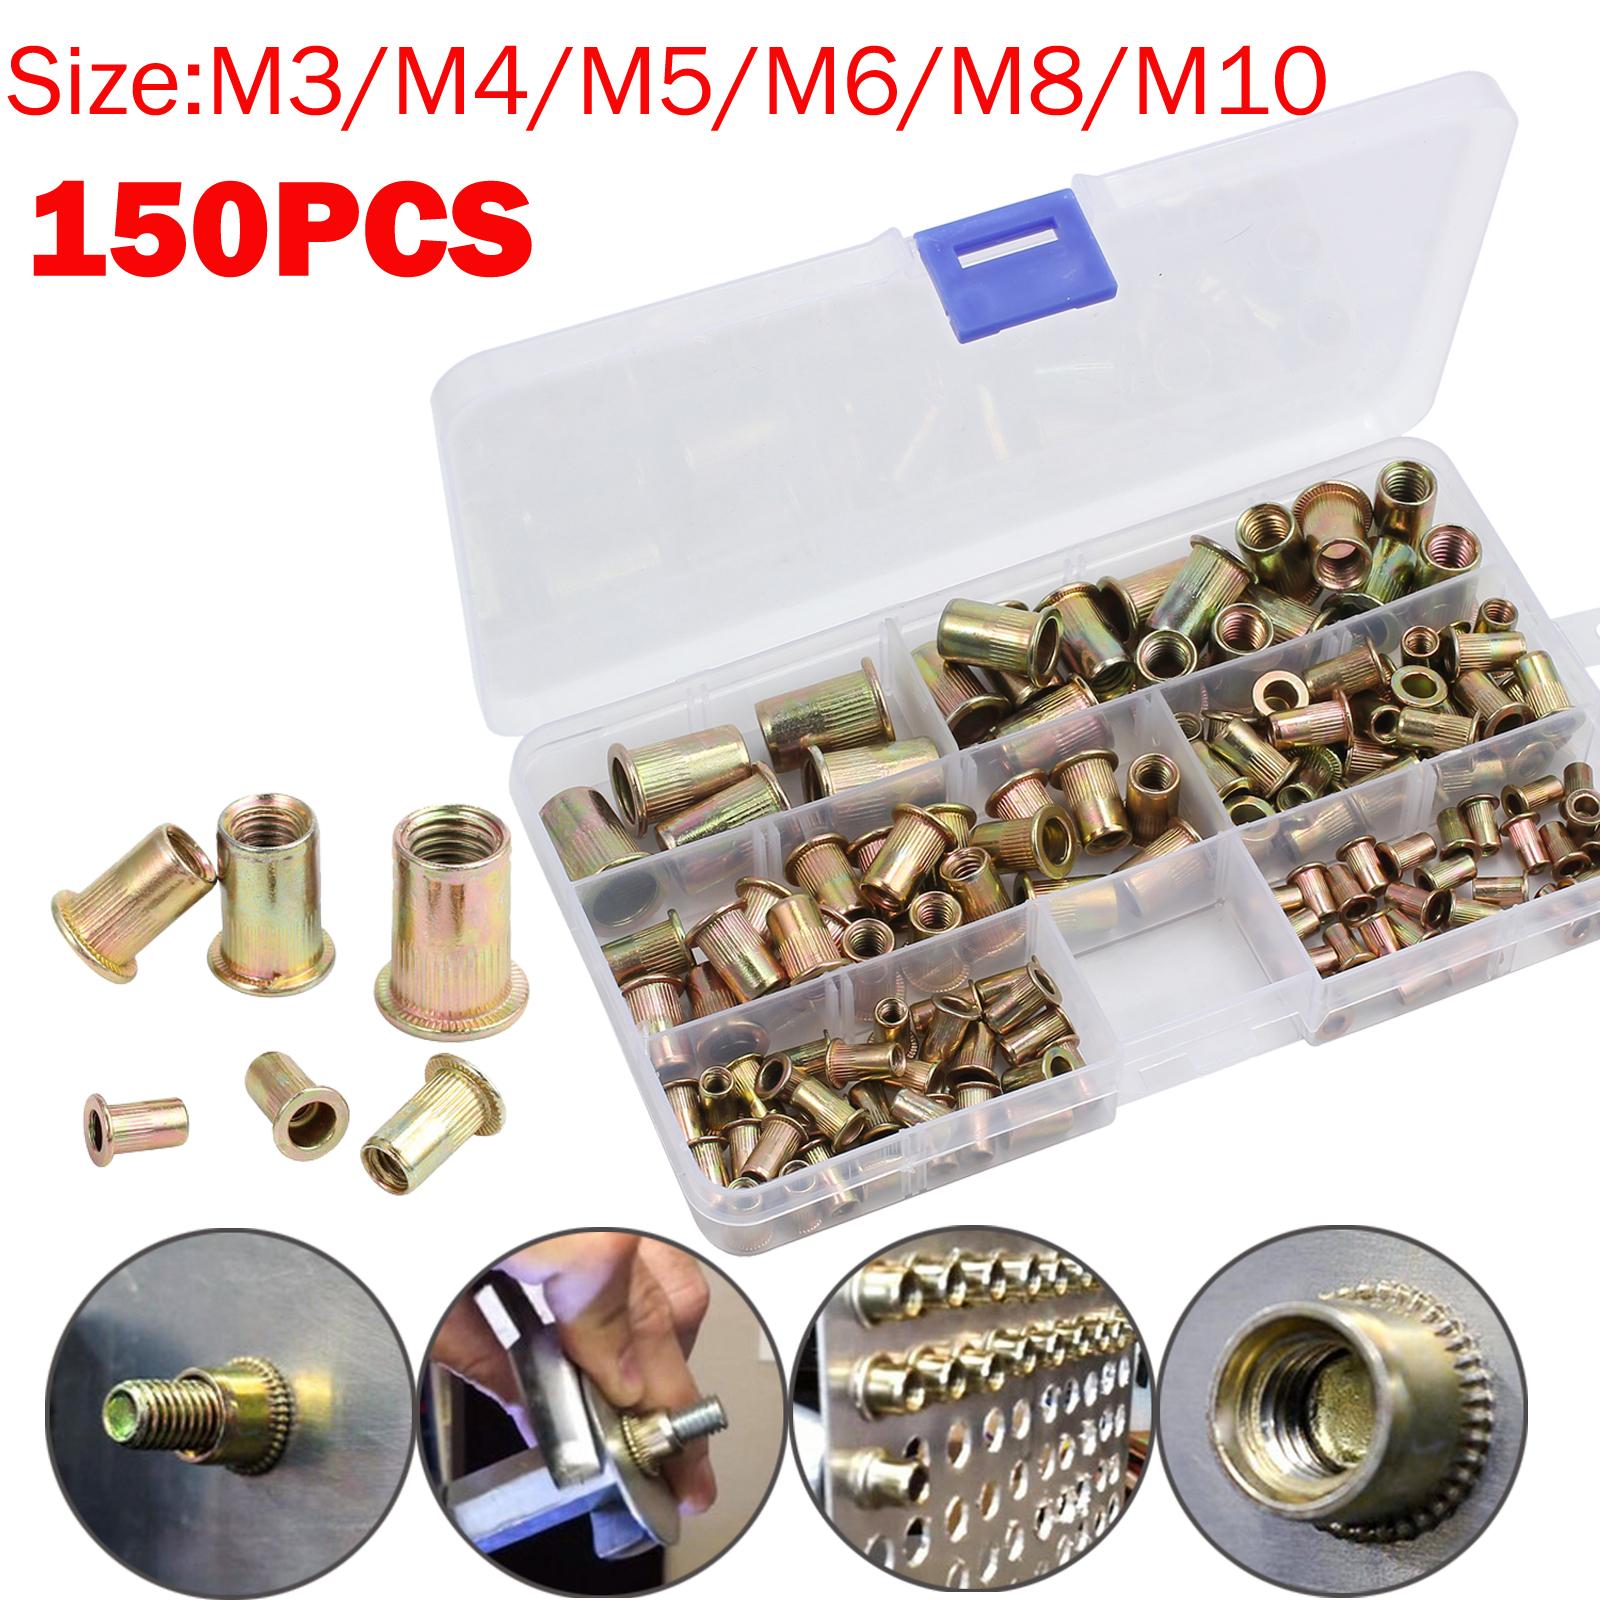 150pcs Zinc Plated Metric Rivet Nut Kit Steel Insert Nutsert Rivnut Assorted Set